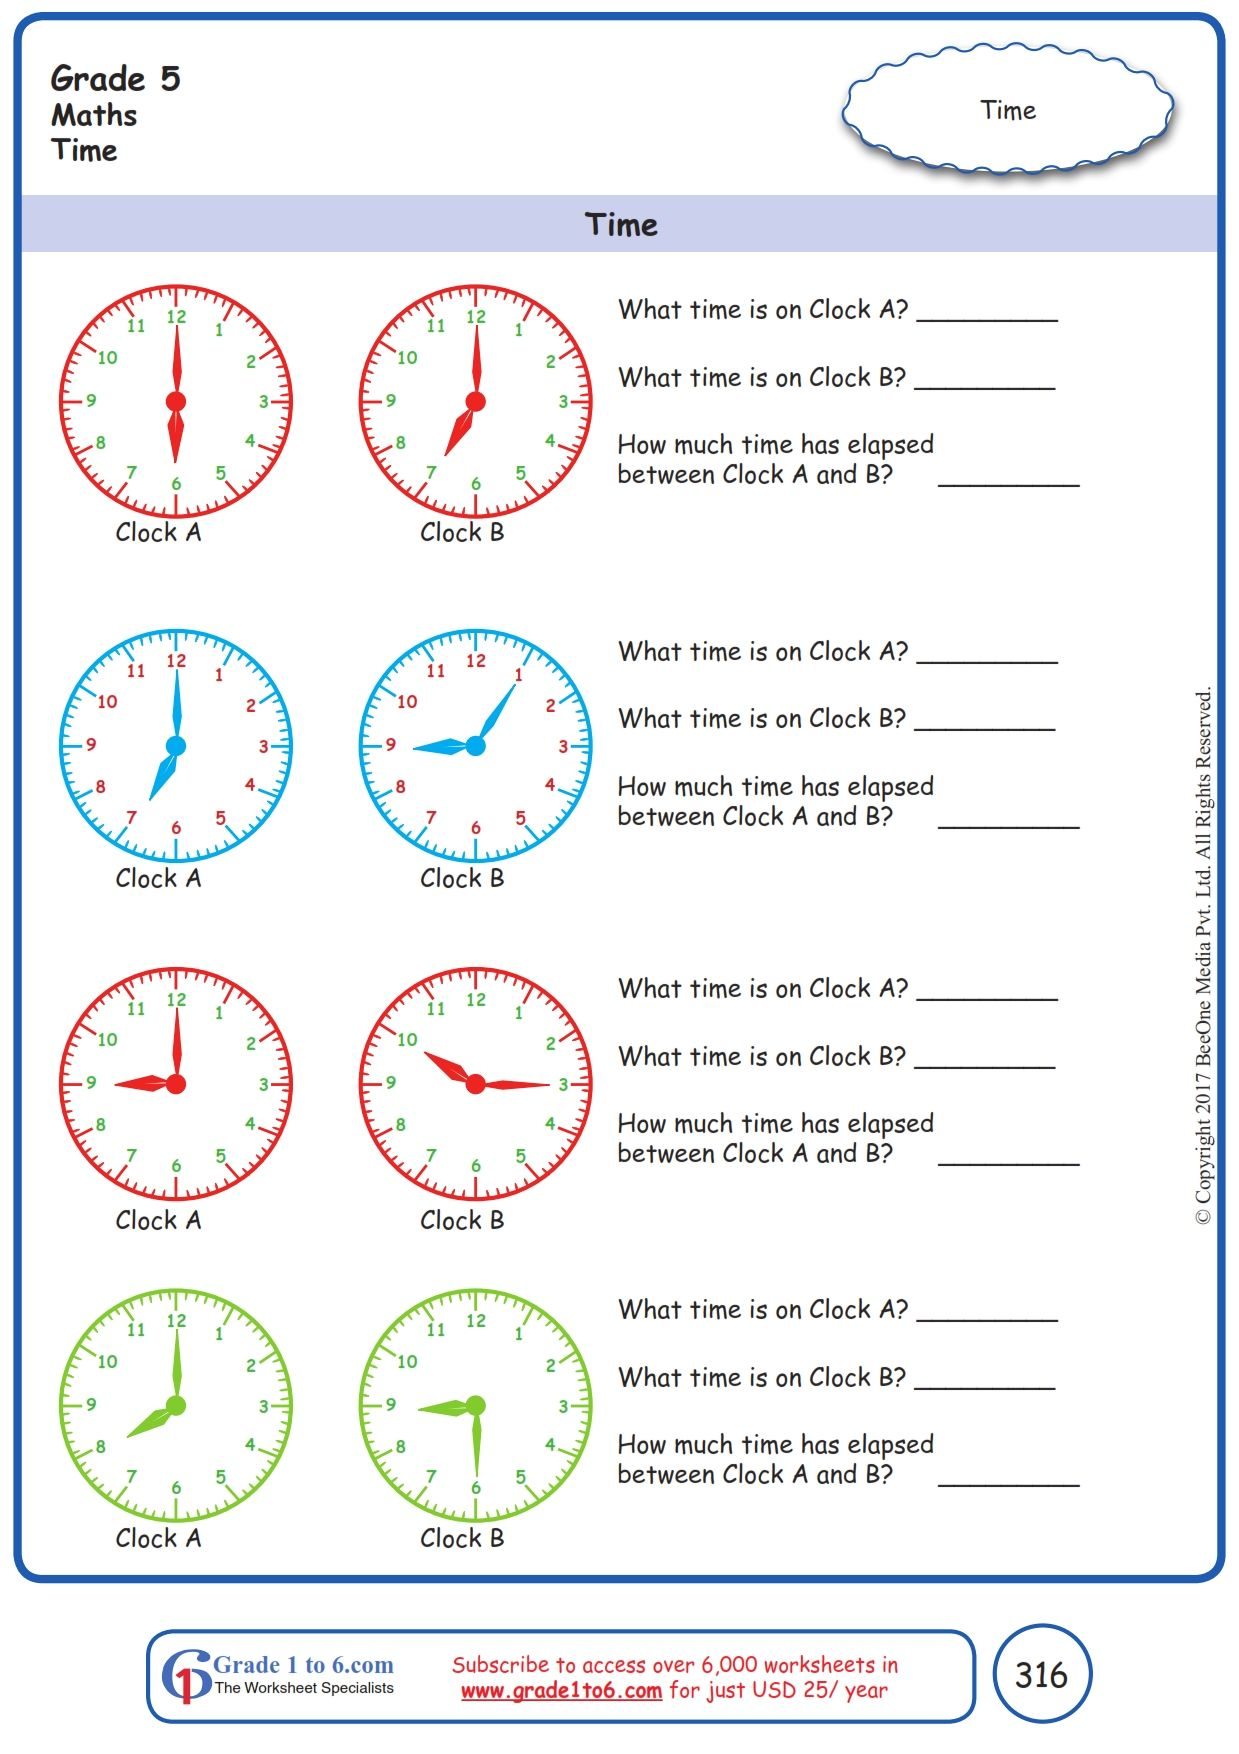 Worksheet Grade 5 Math Time In